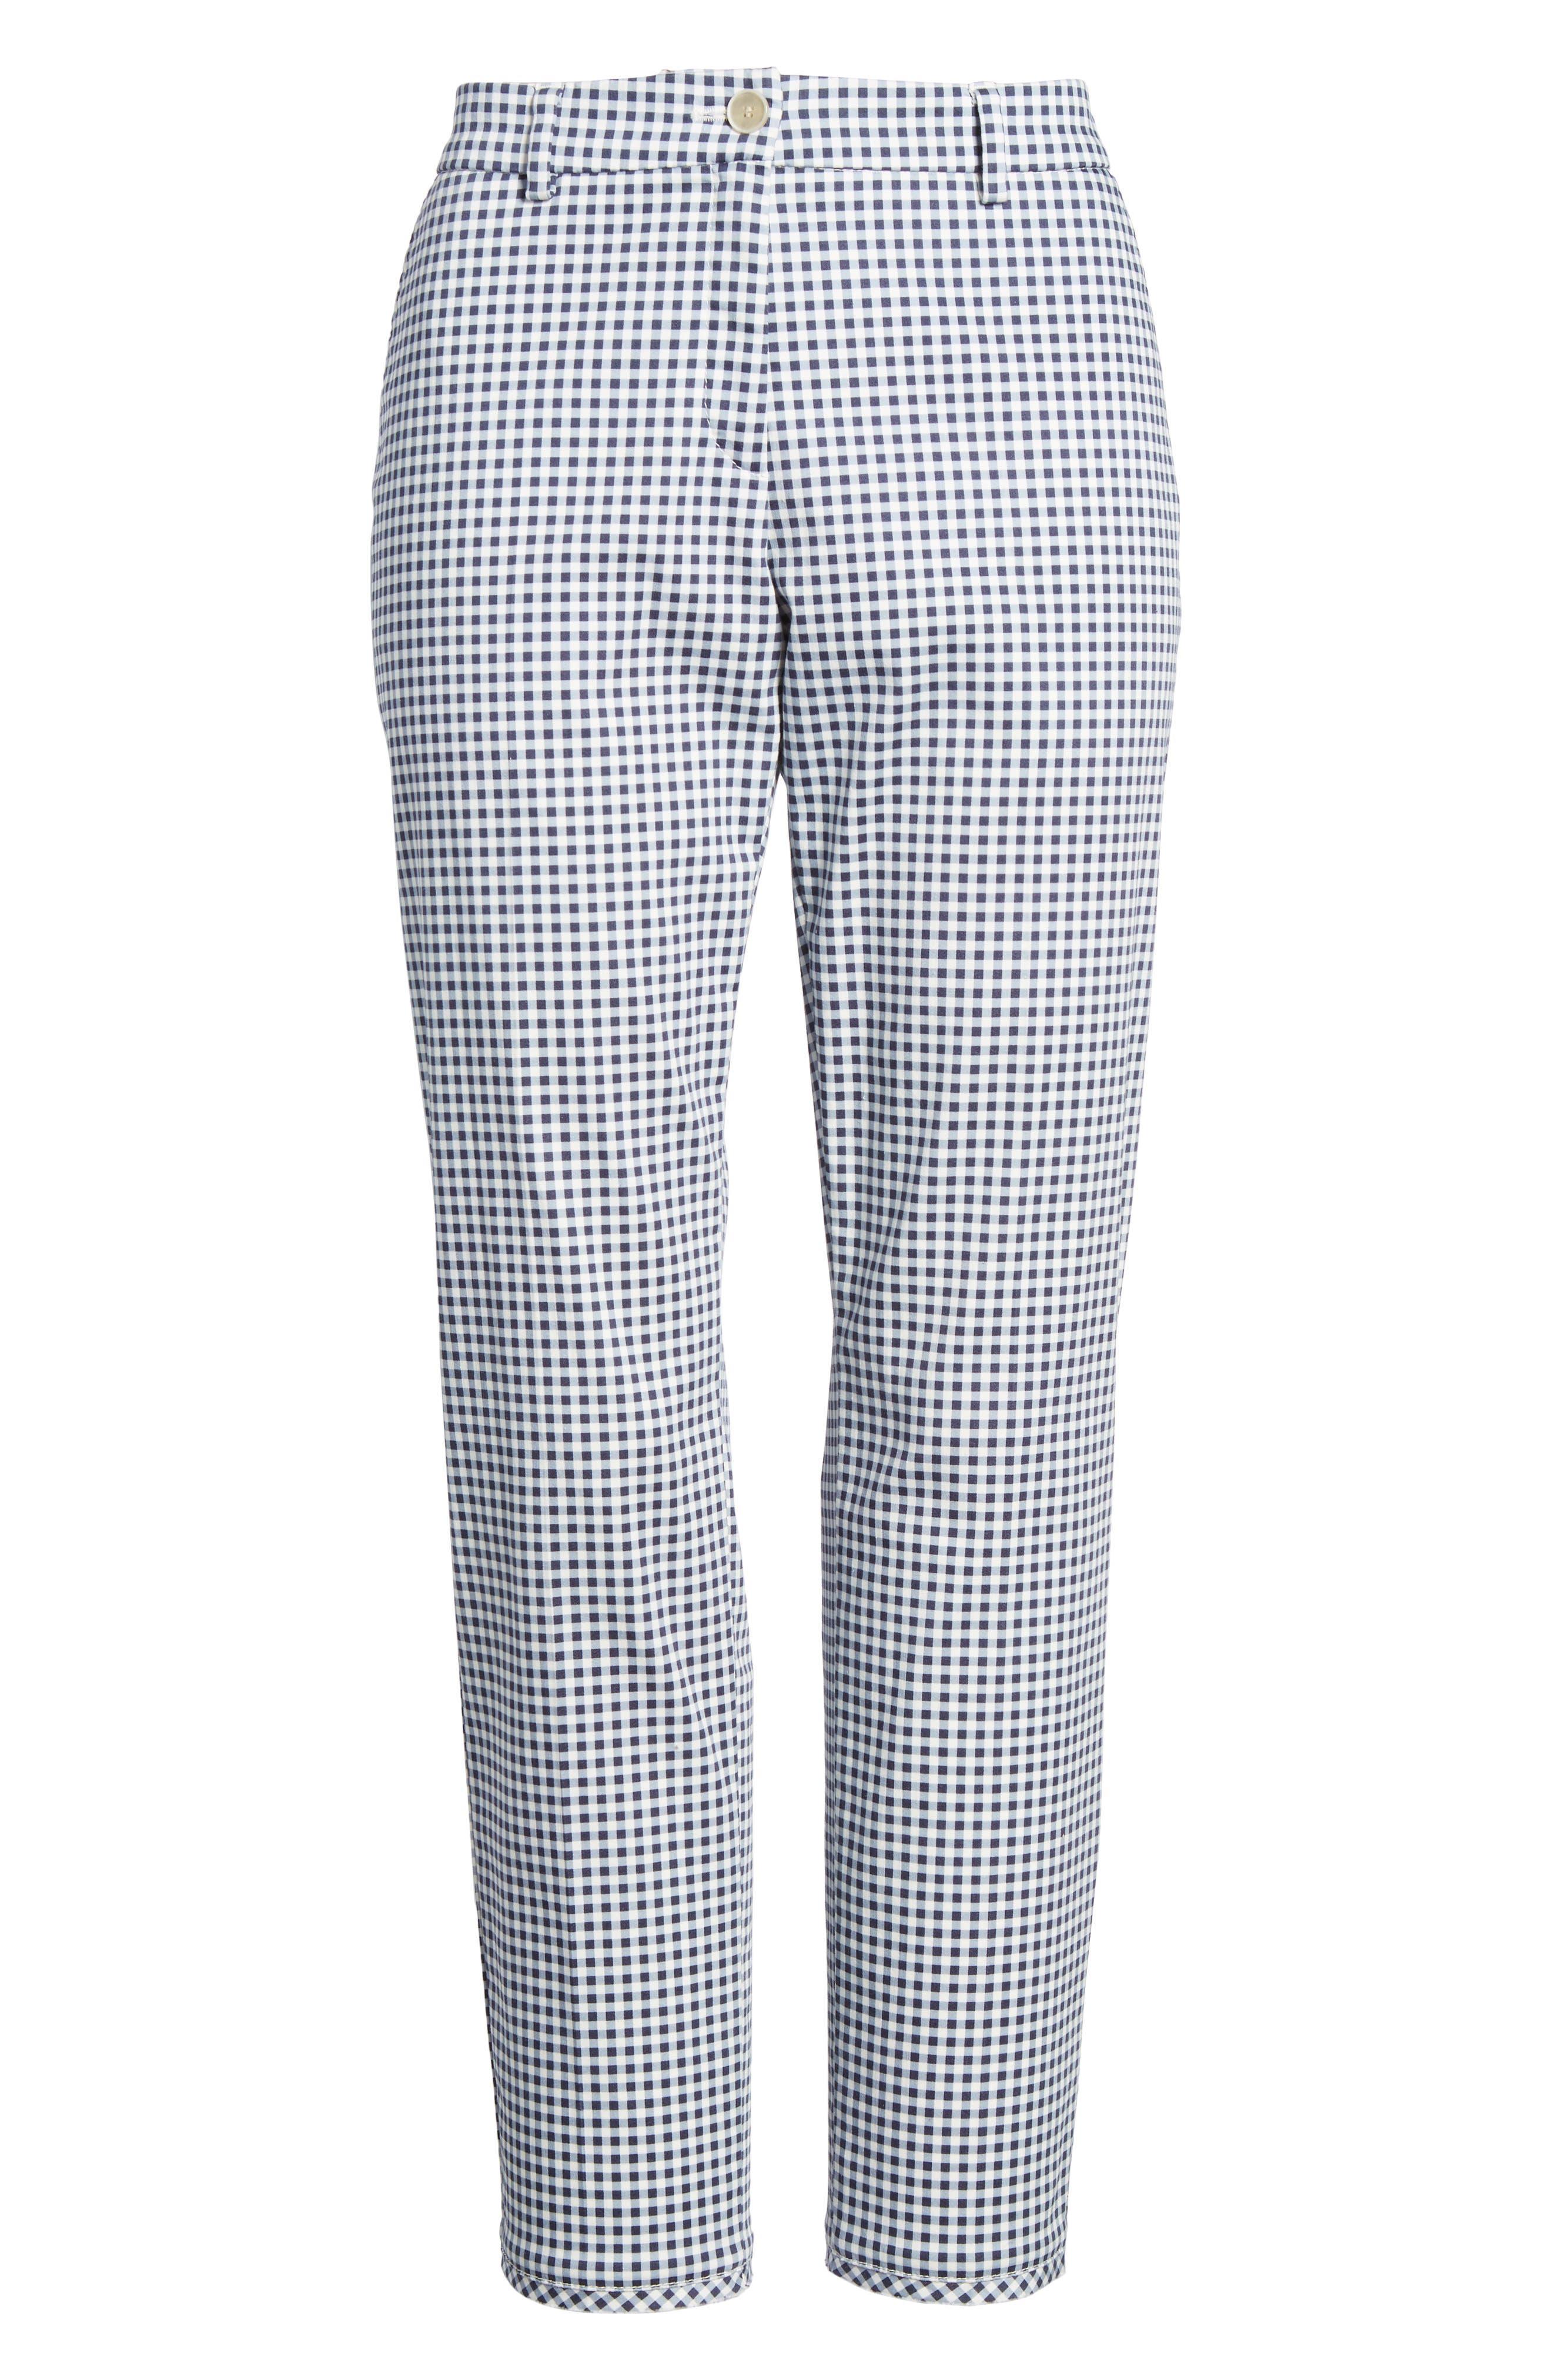 Maron Gingham Stretch Cotton Pants,                             Alternate thumbnail 6, color,                             OCEAN